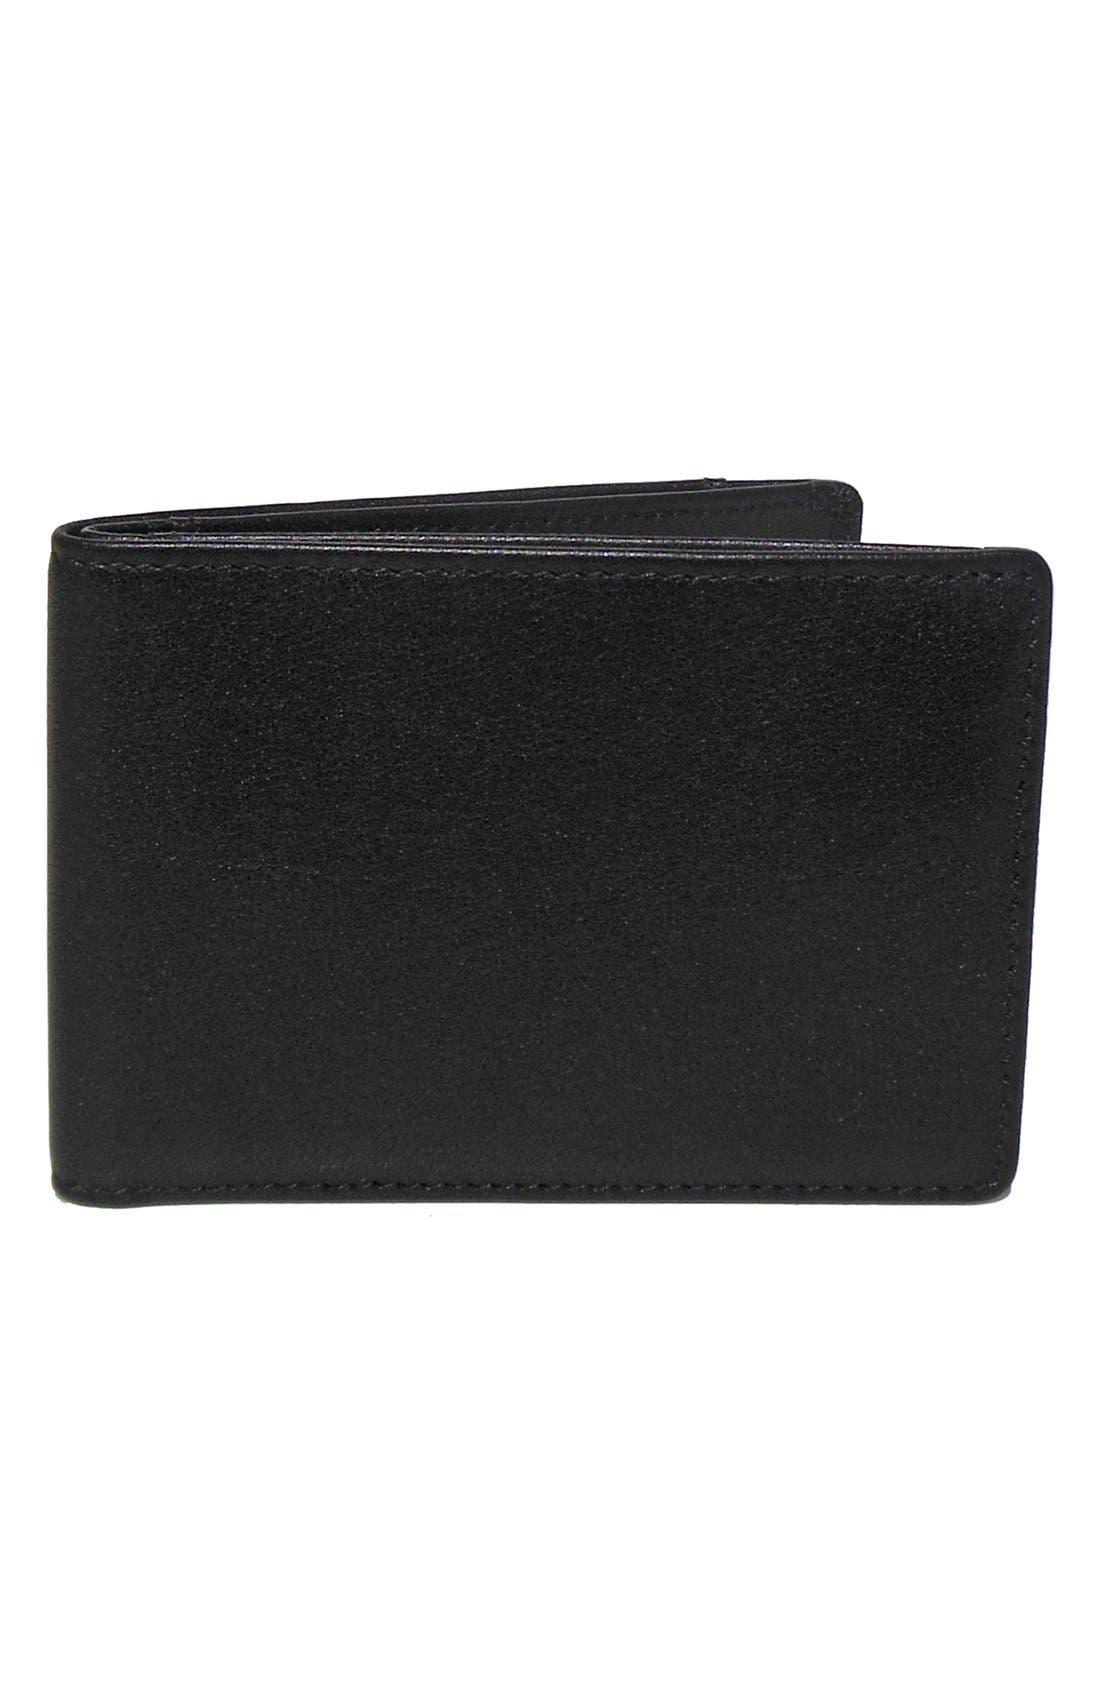 'Grant Slimster' RFID Blocker Leather Wallet,                         Main,                         color,